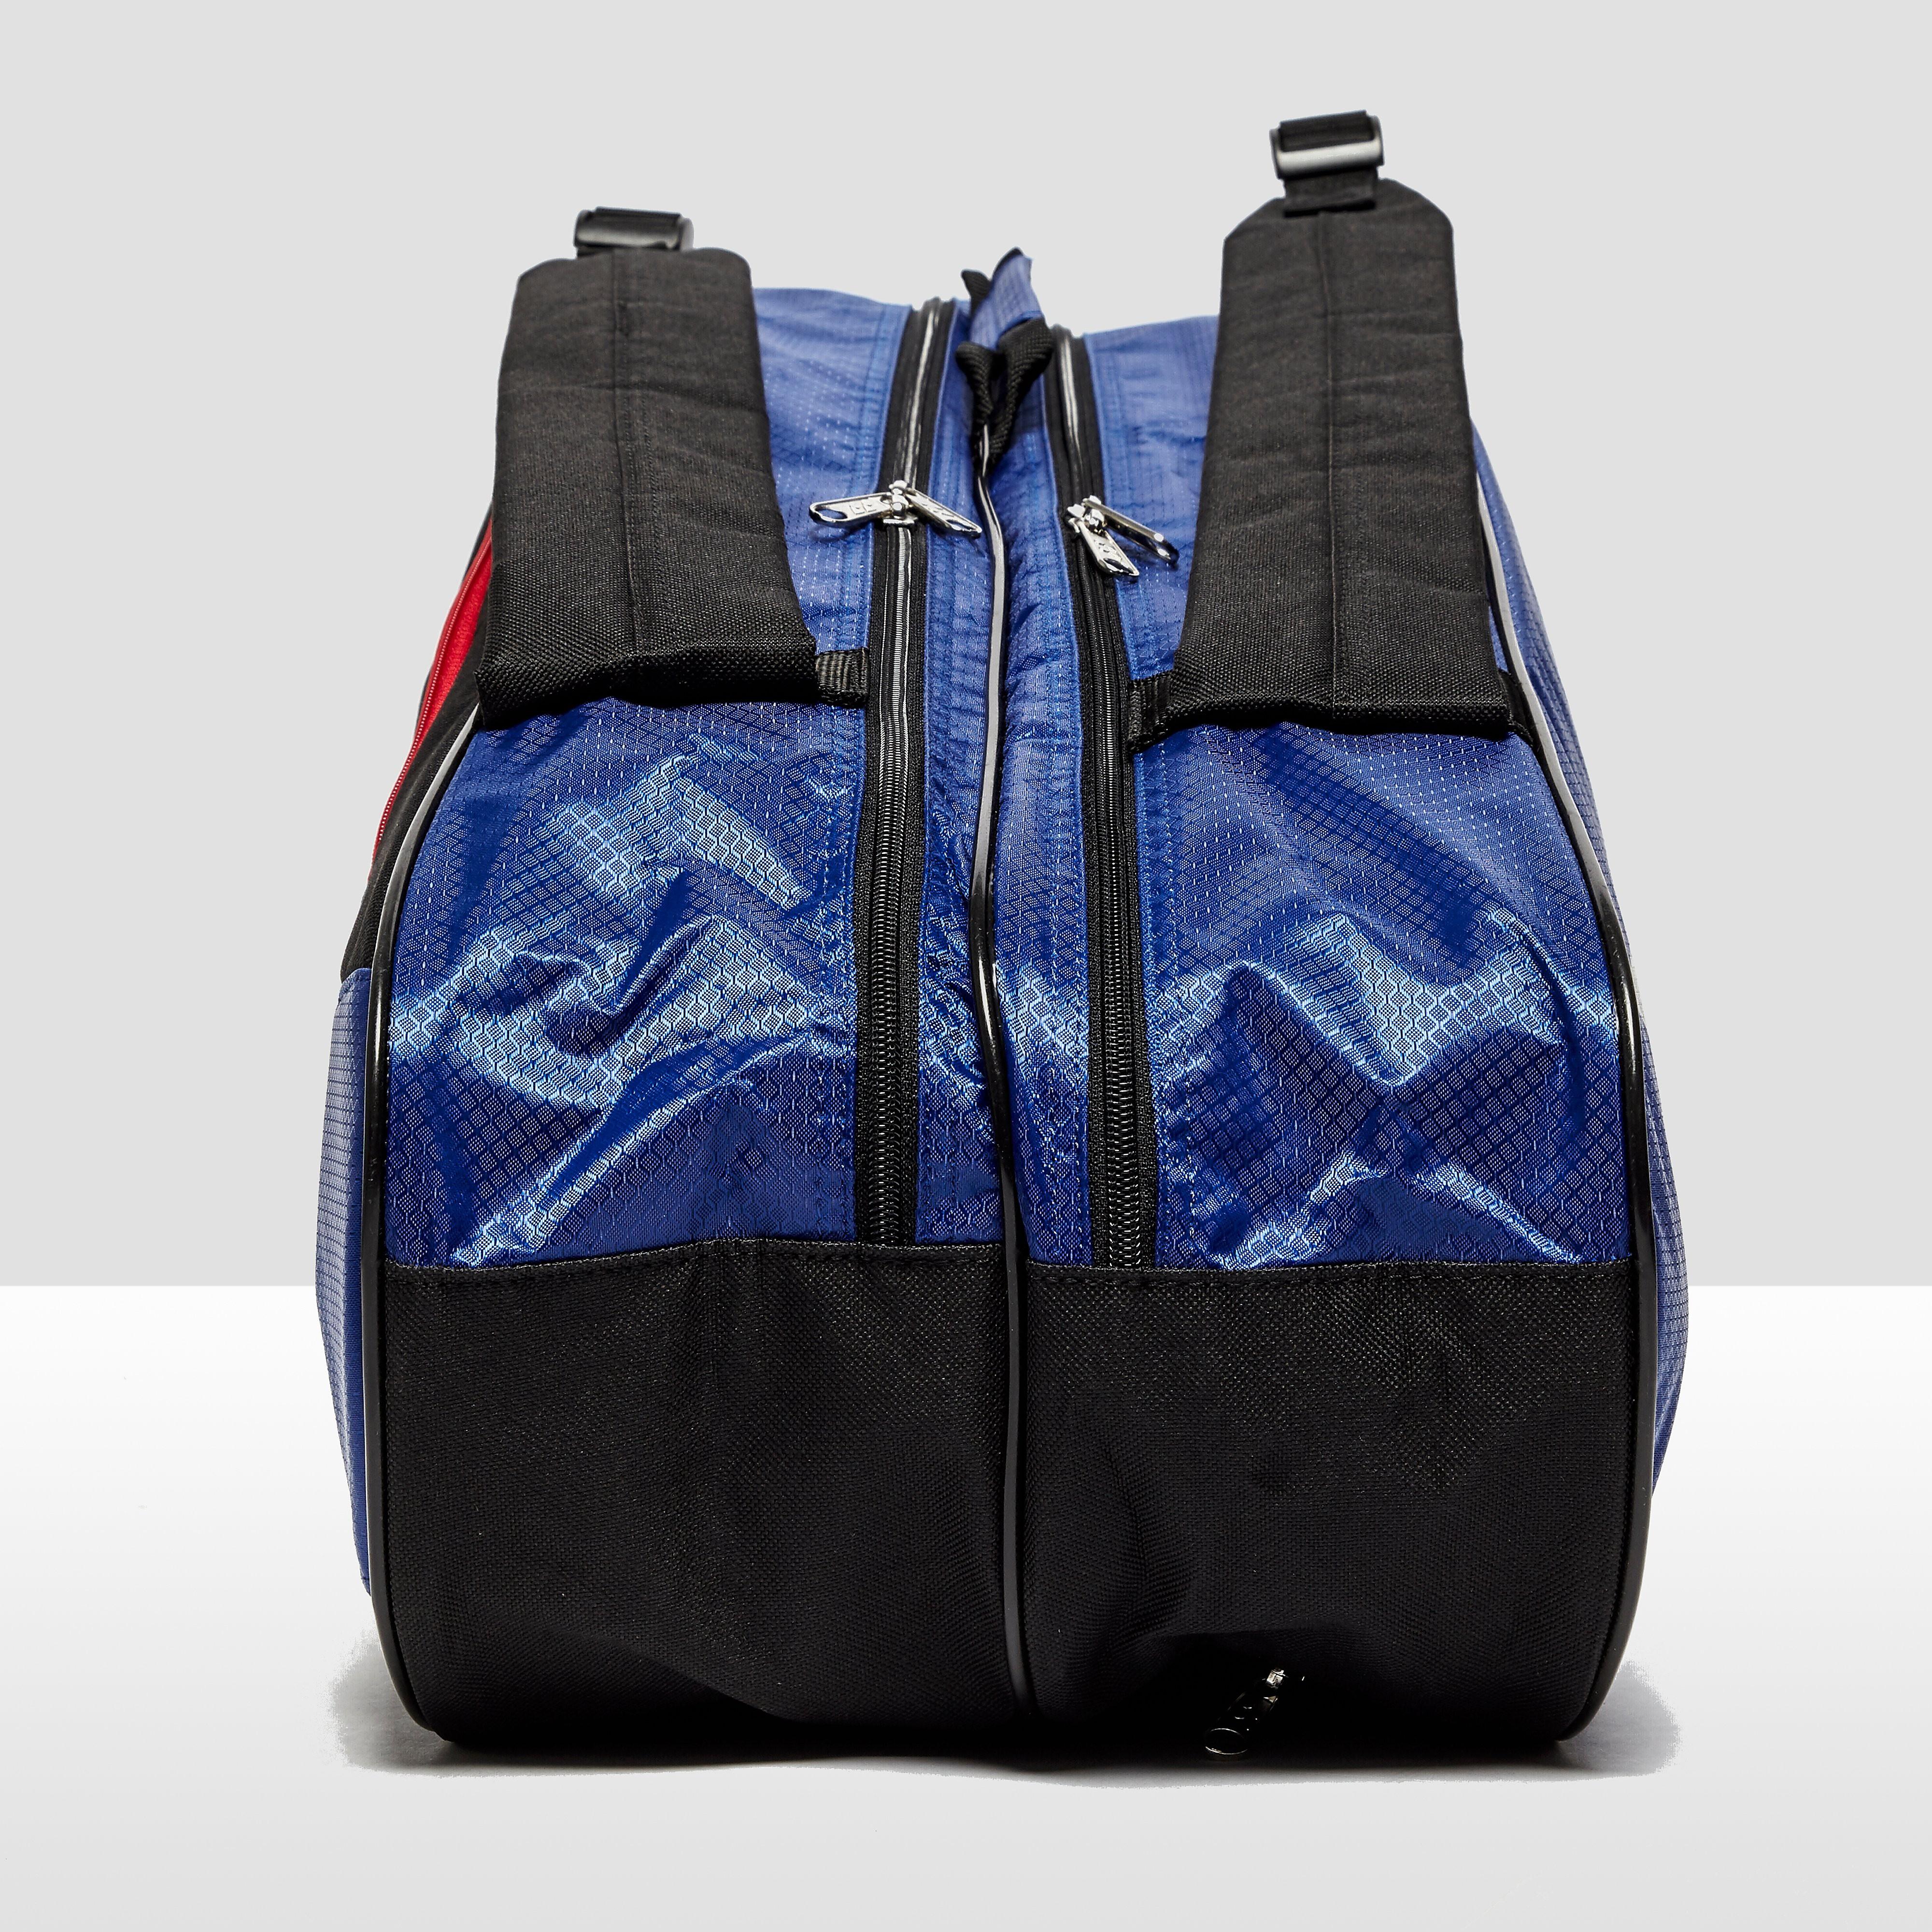 Yonex X6 Racket Bag